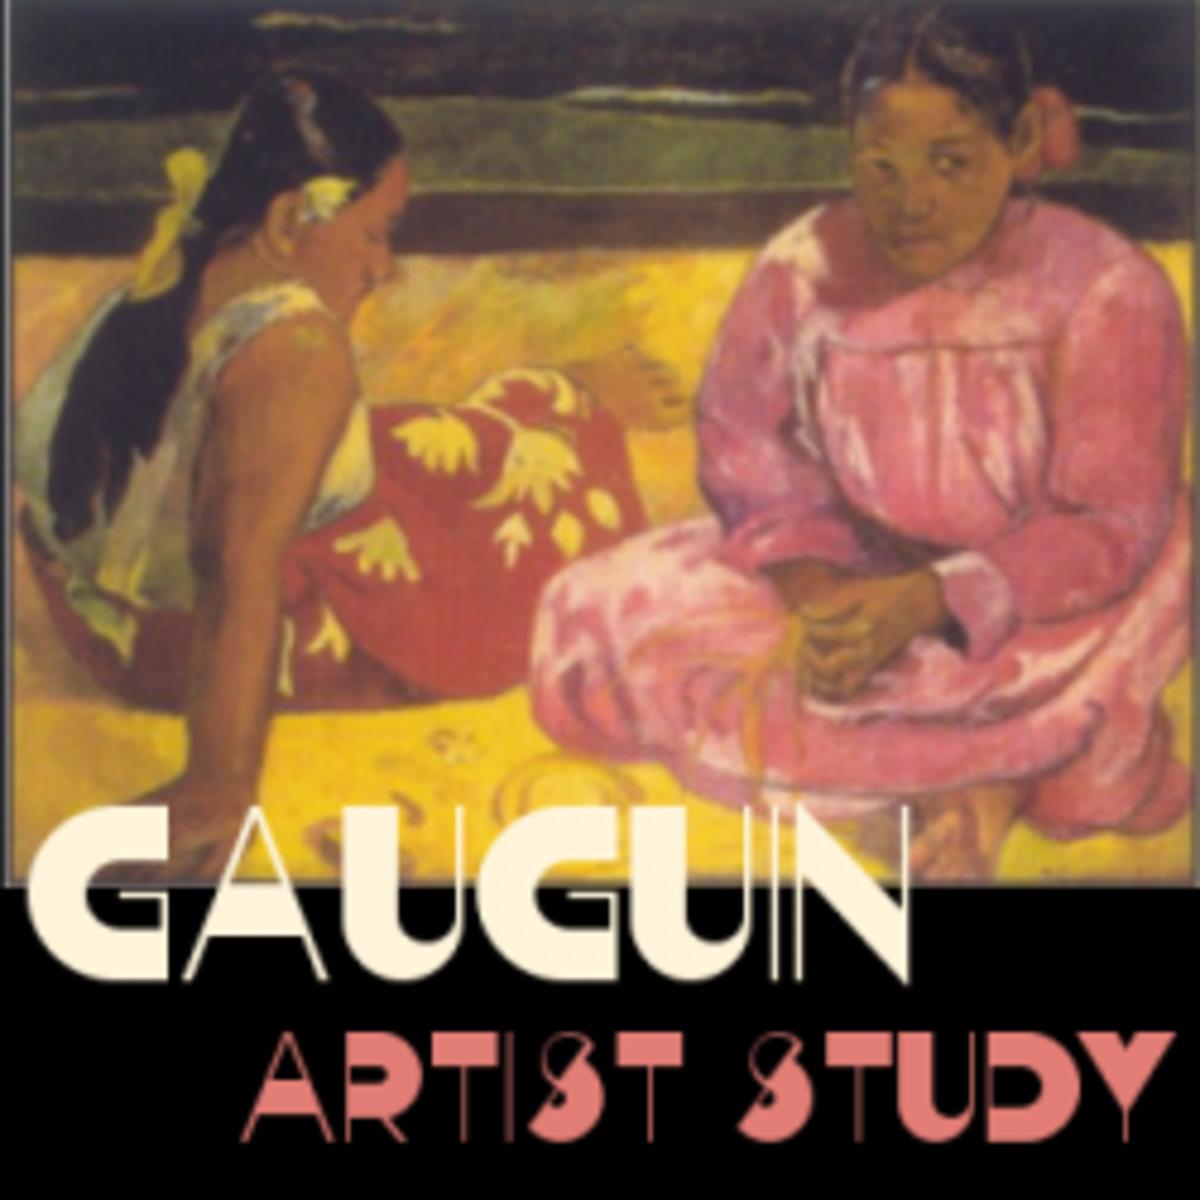 Gauguin Artist Study